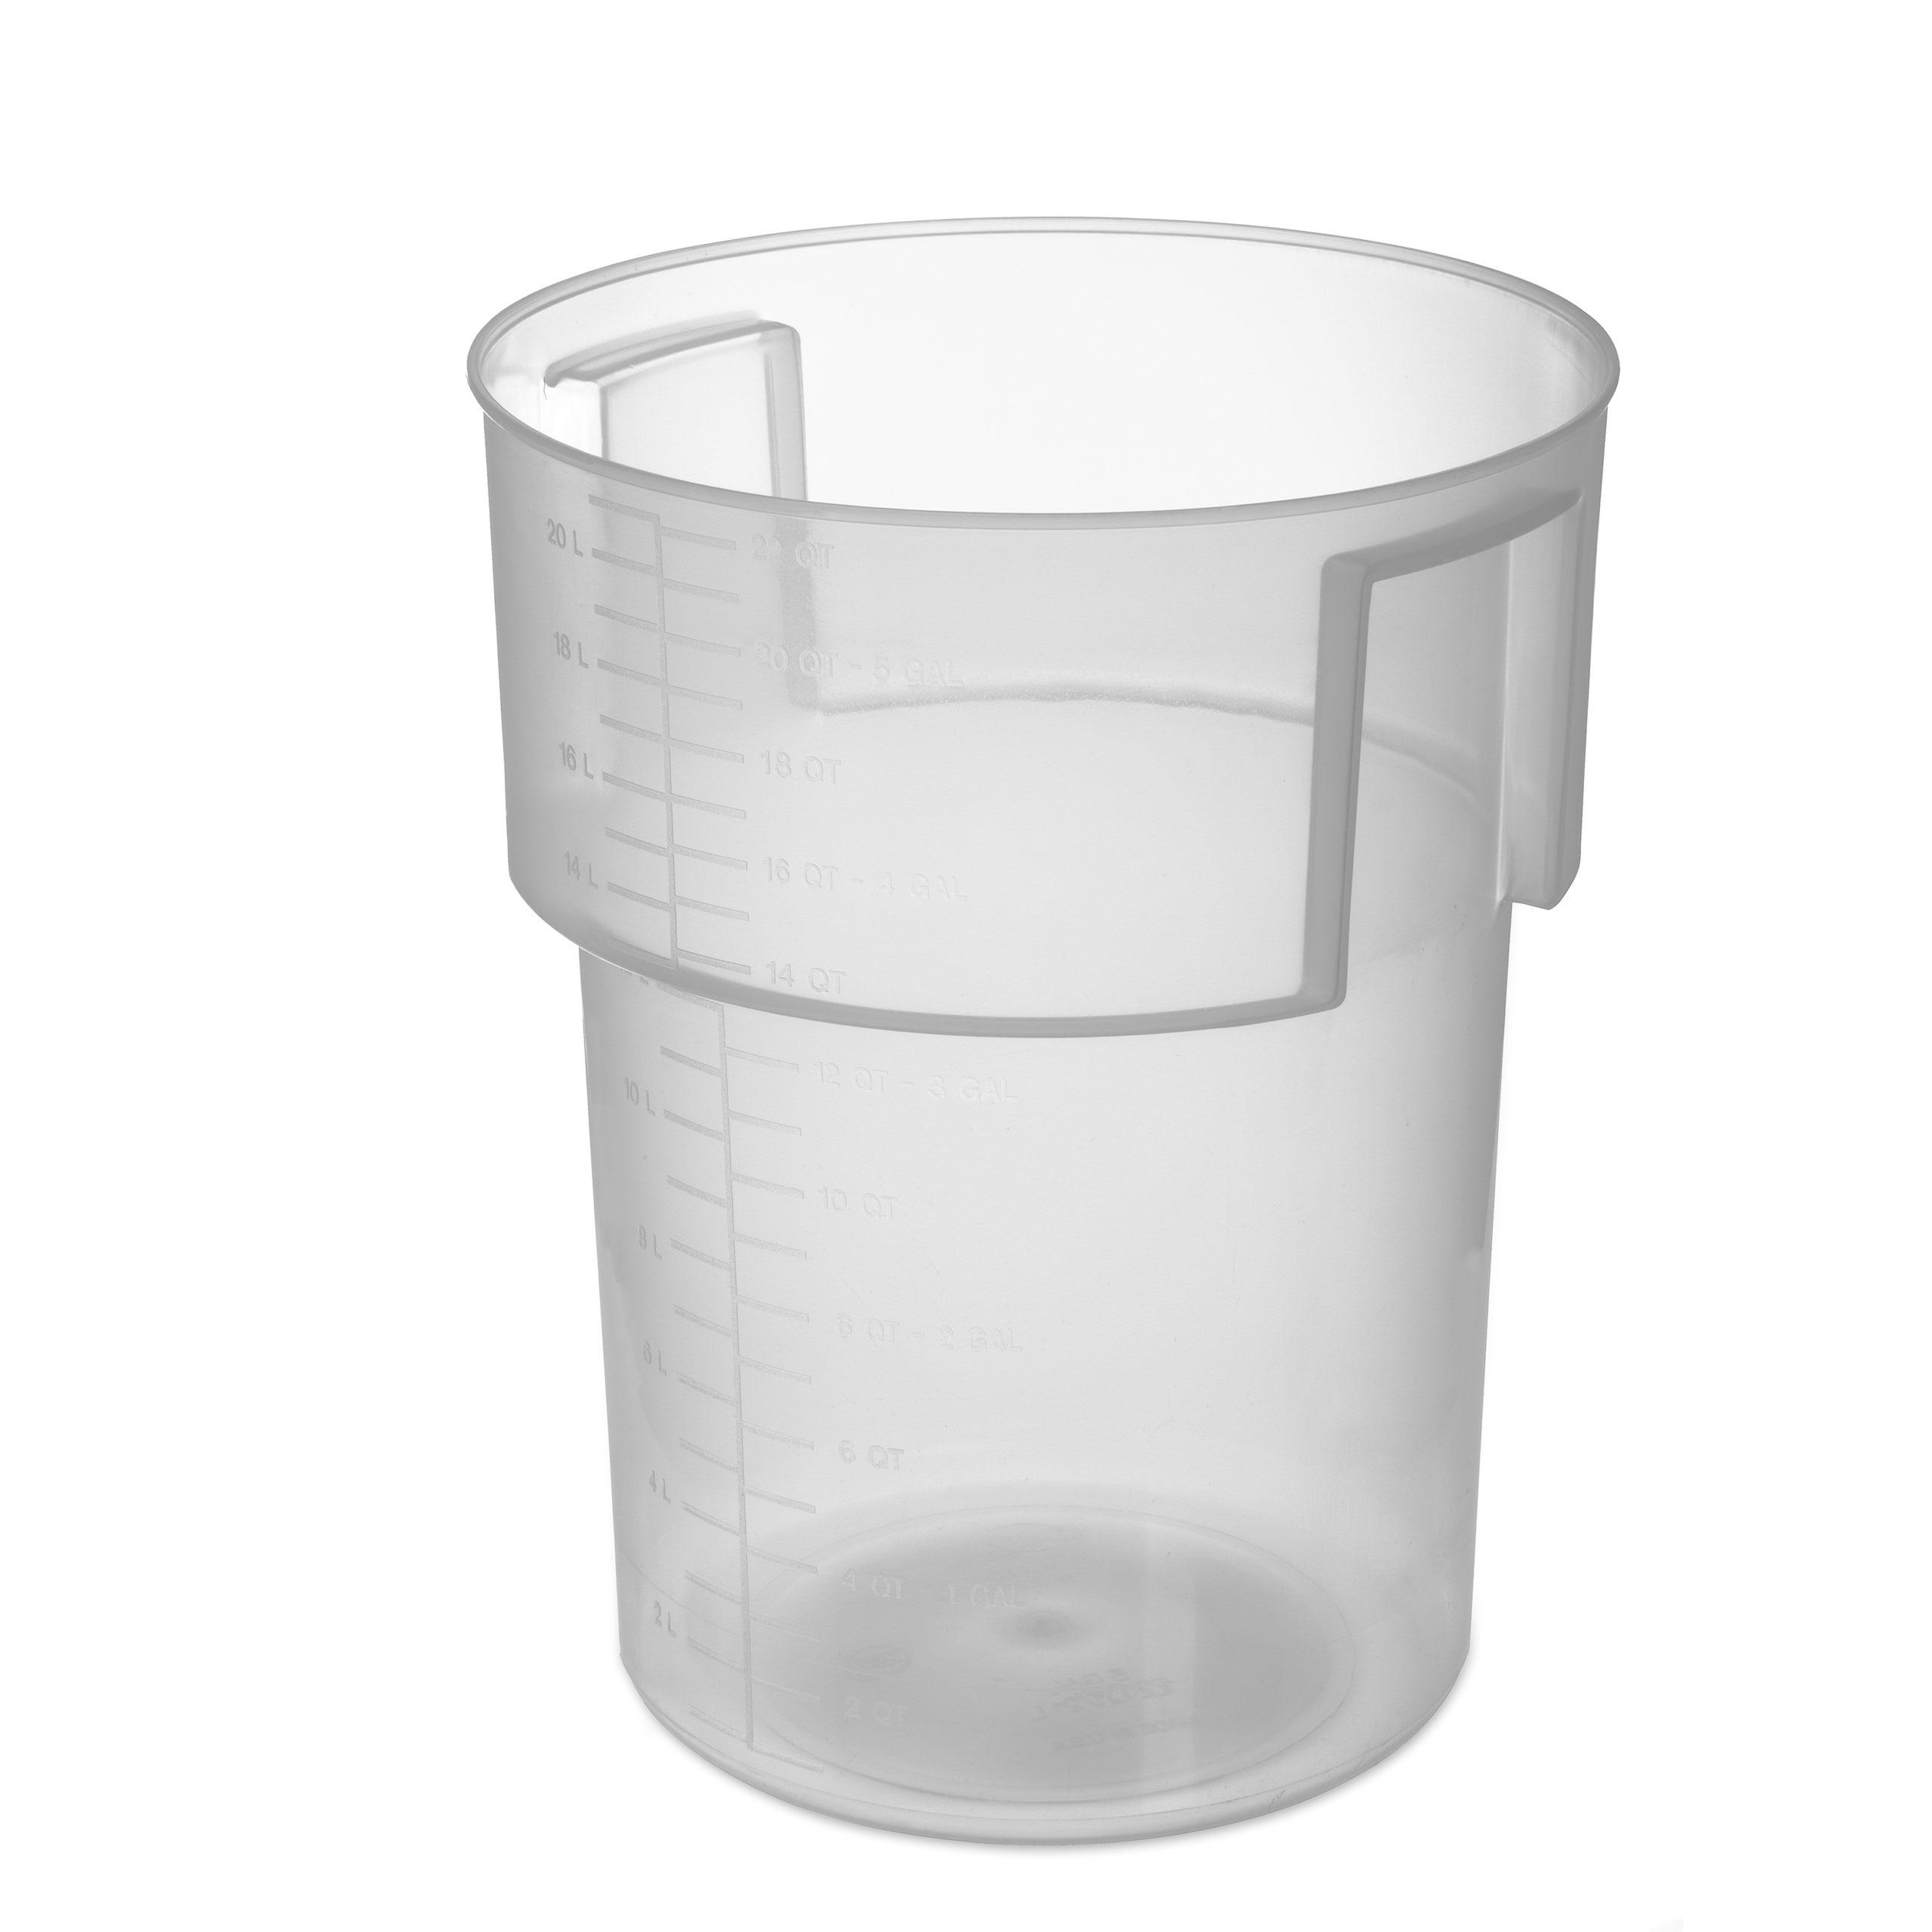 22 Qt. Translucent Plastic Bain Marie, Carlisle 220530